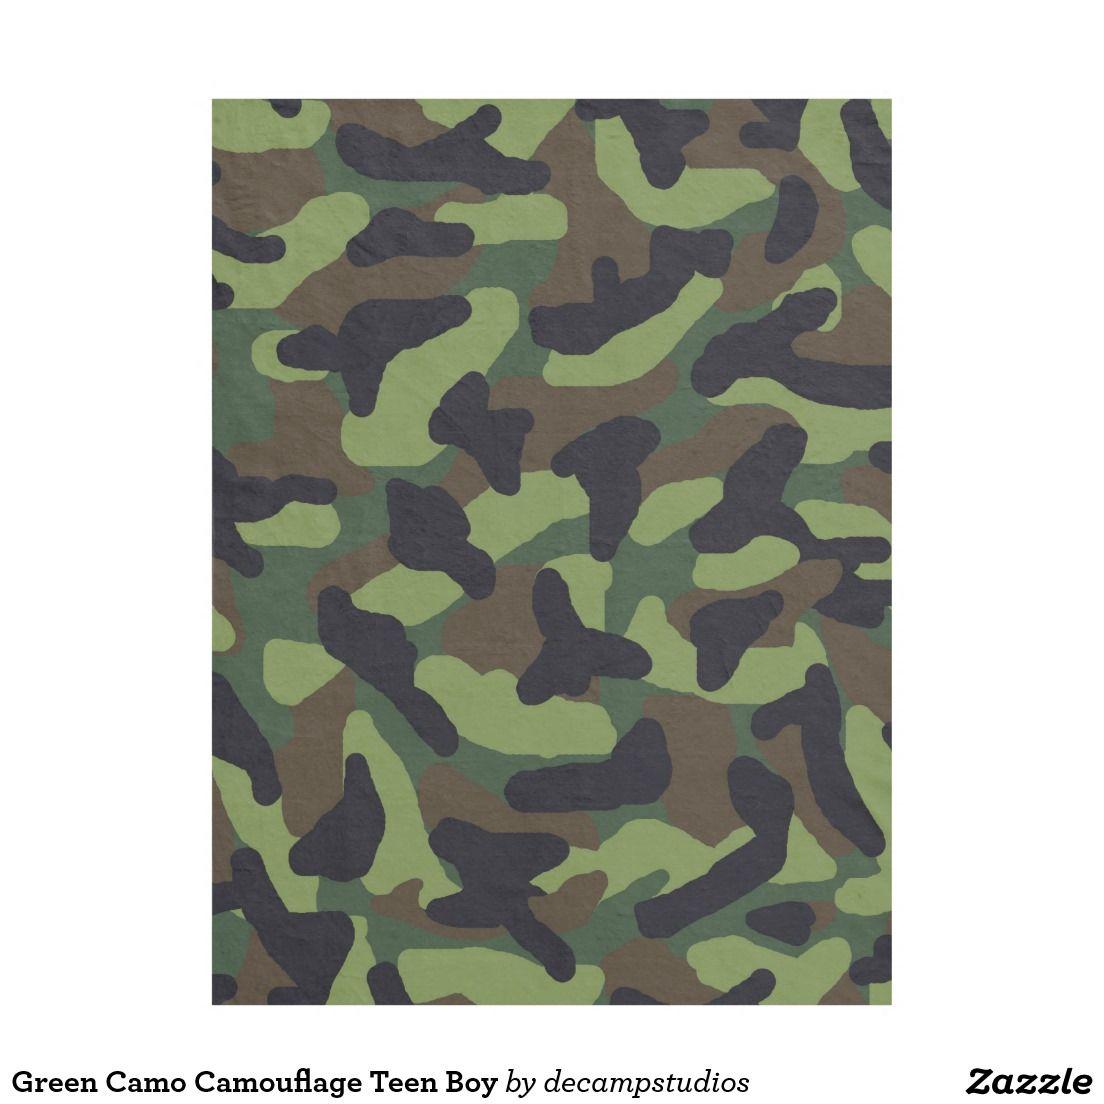 Green camo camouflage teen boy fleece blanket teen boys camo